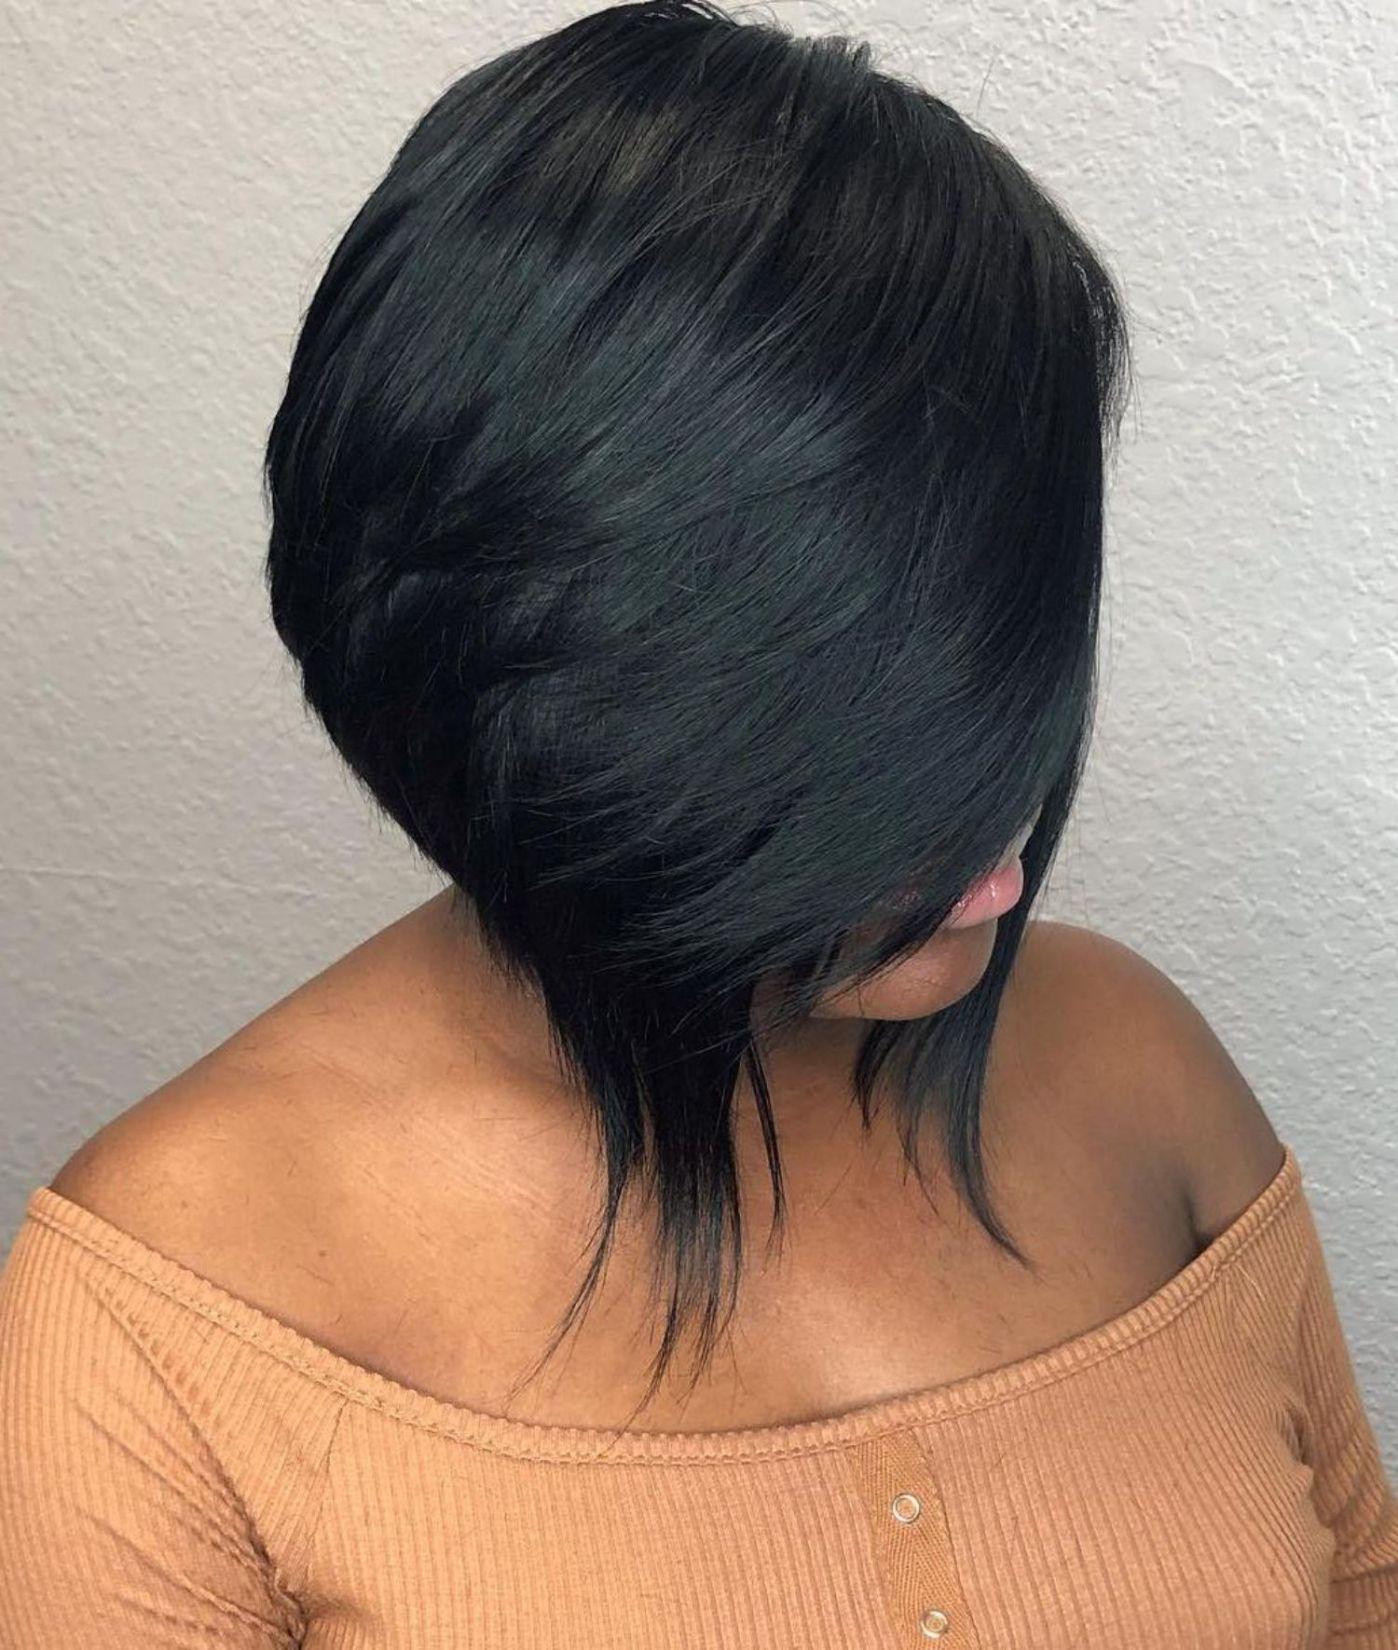 60 Showiest Bob Haircuts For Black Women Bob Hairstyles Angled Bob Hairstyles Bobs Haircuts